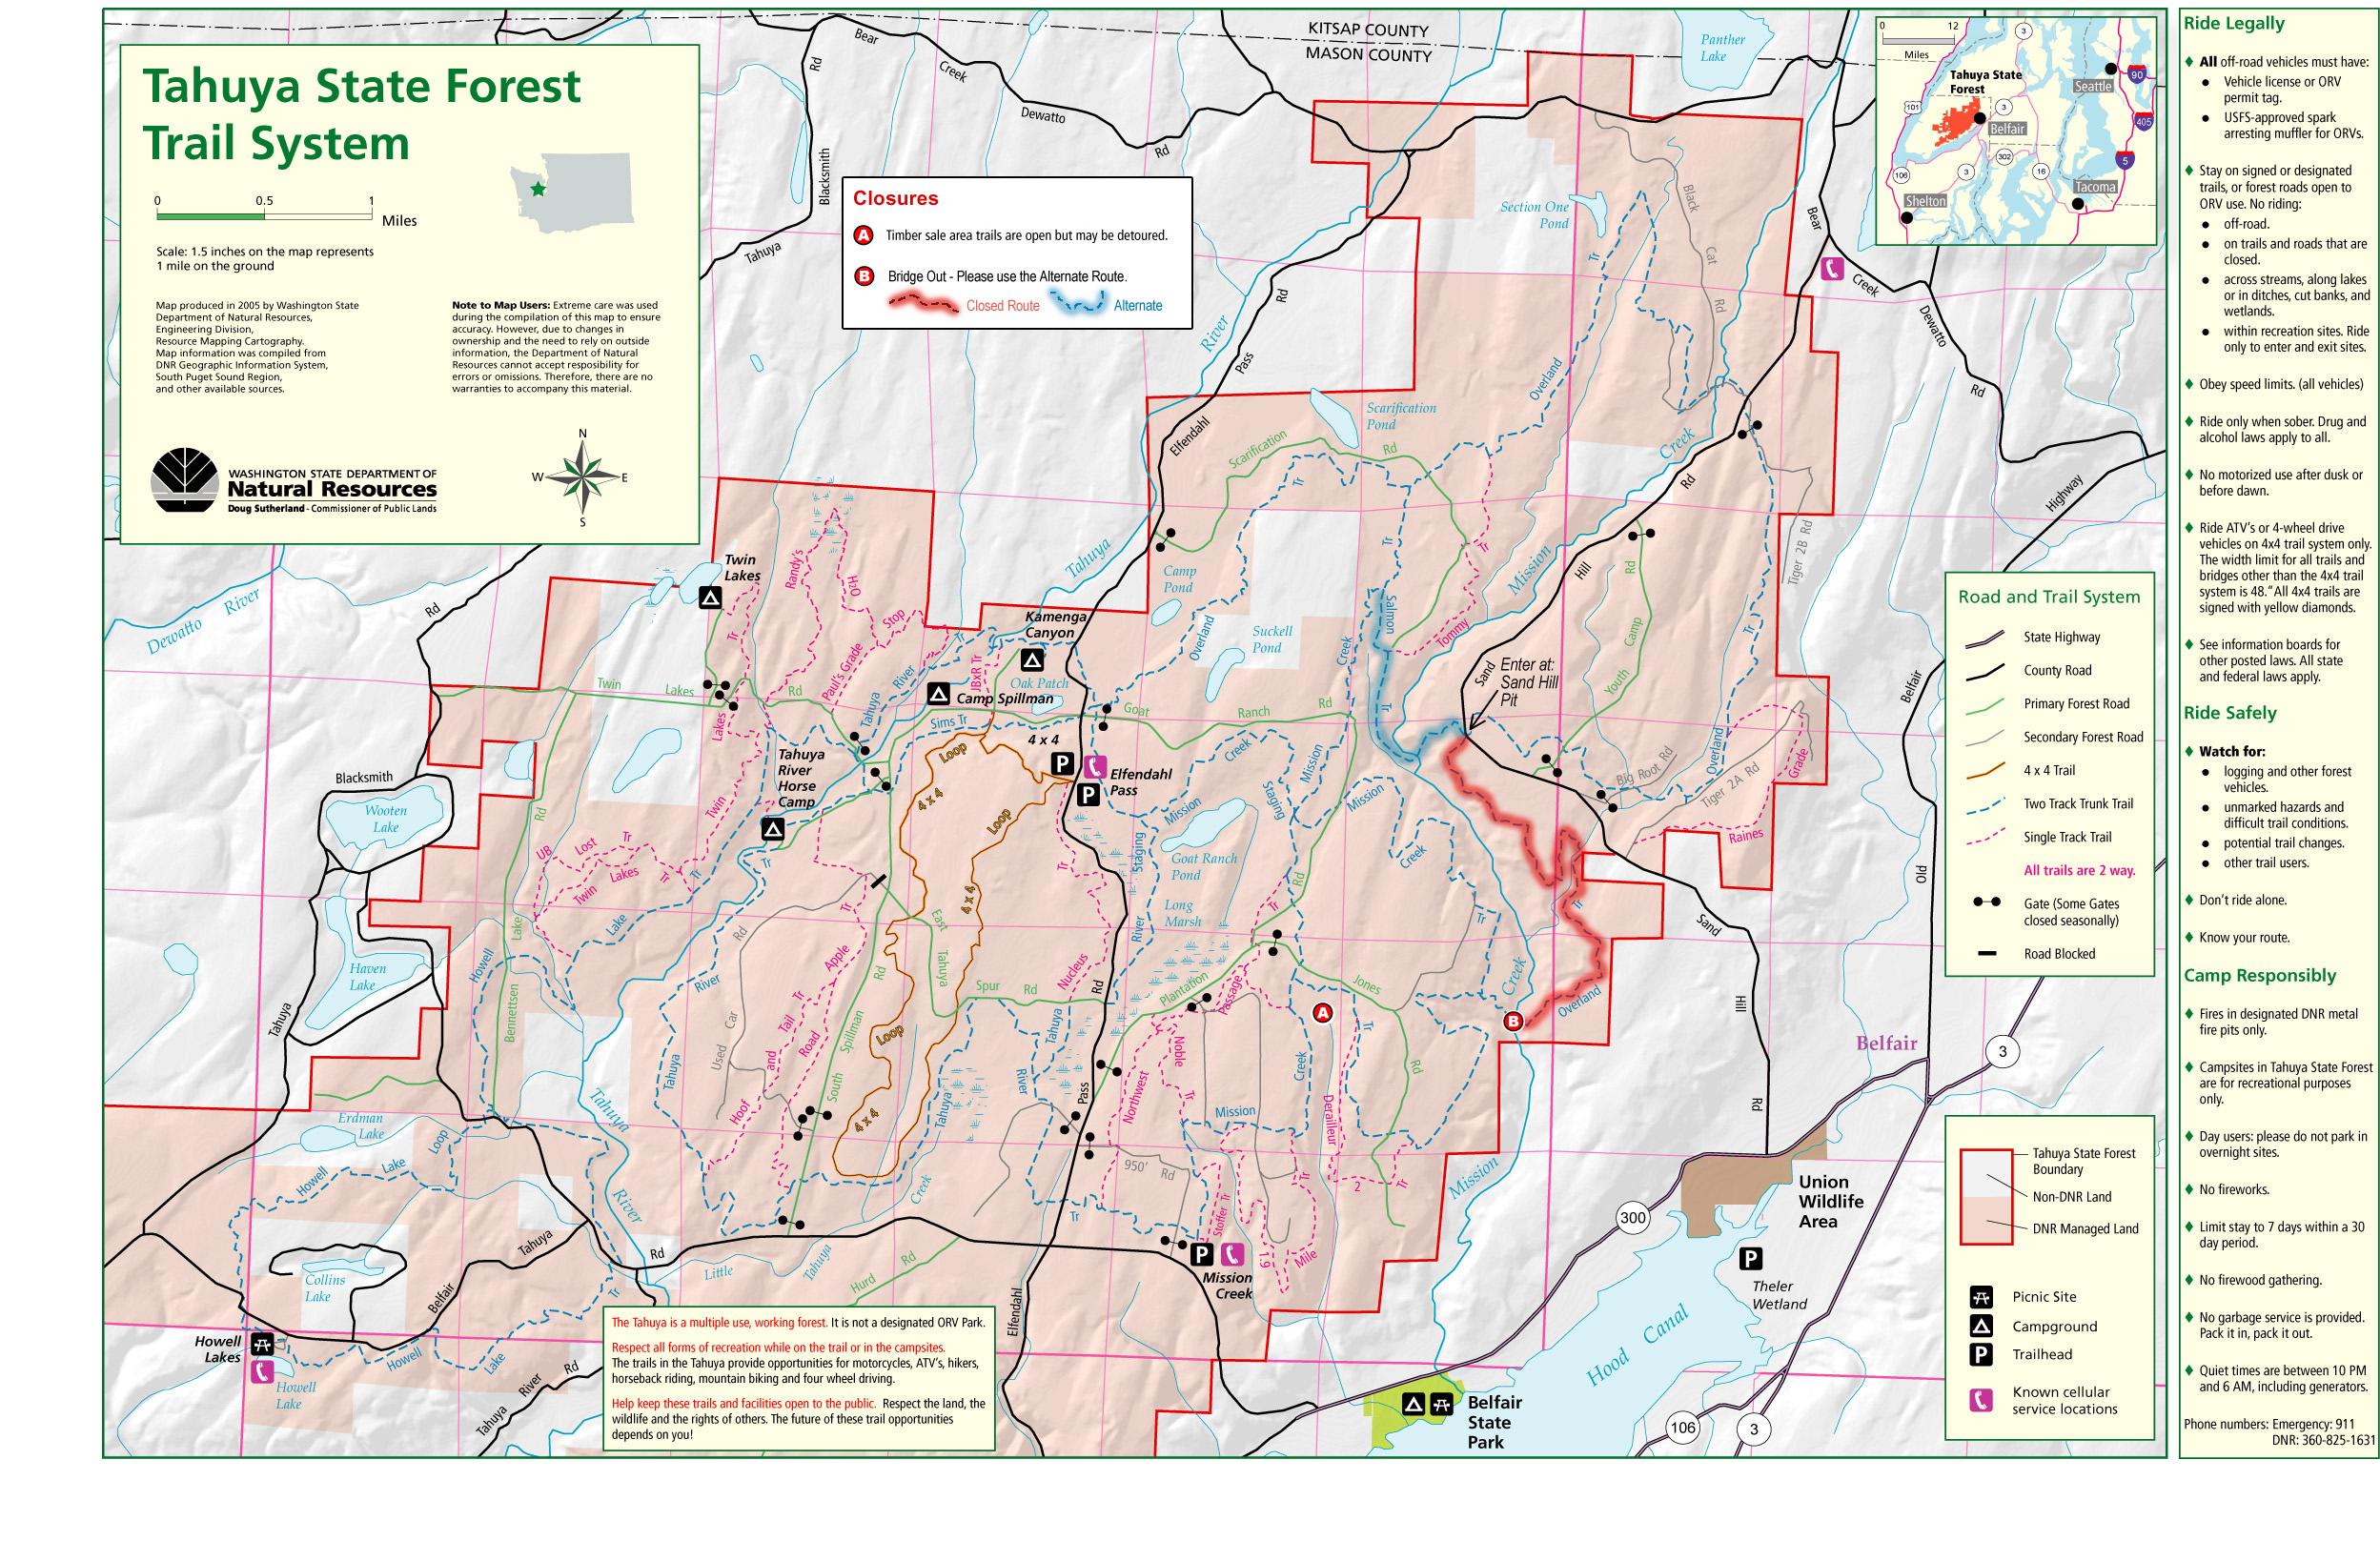 Tahuya State Forest Trail Map - Belfair Washington • mappery on